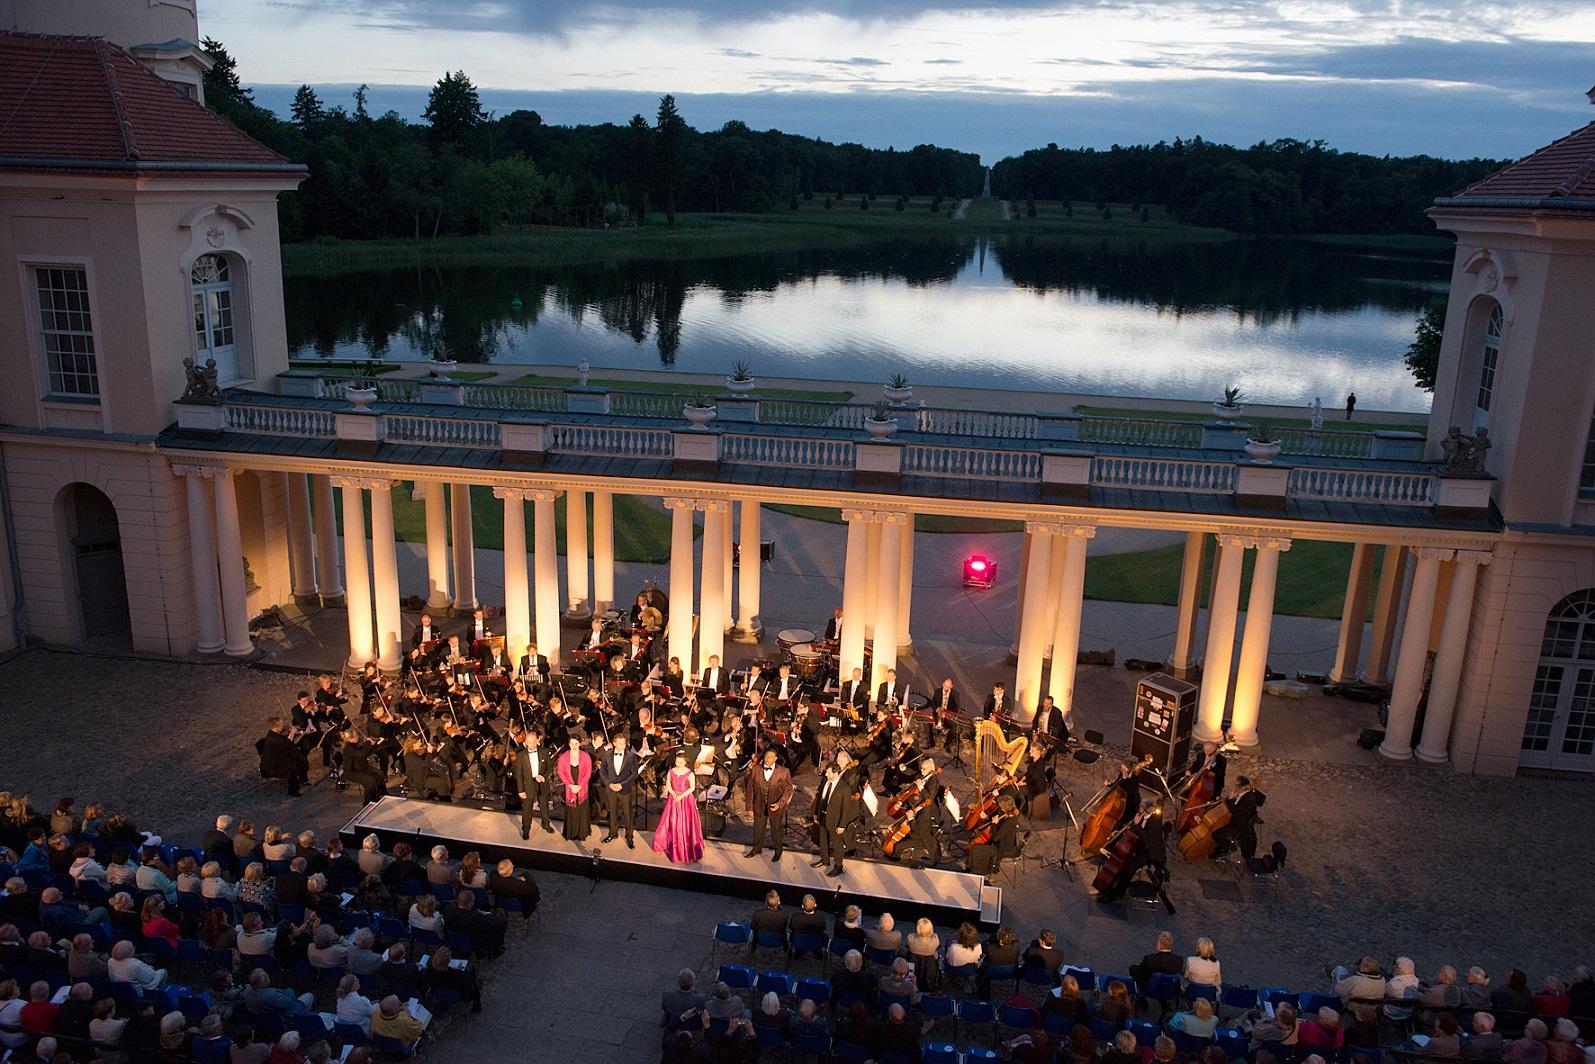 Operngala im Schlosshof Rheinsberg 2016